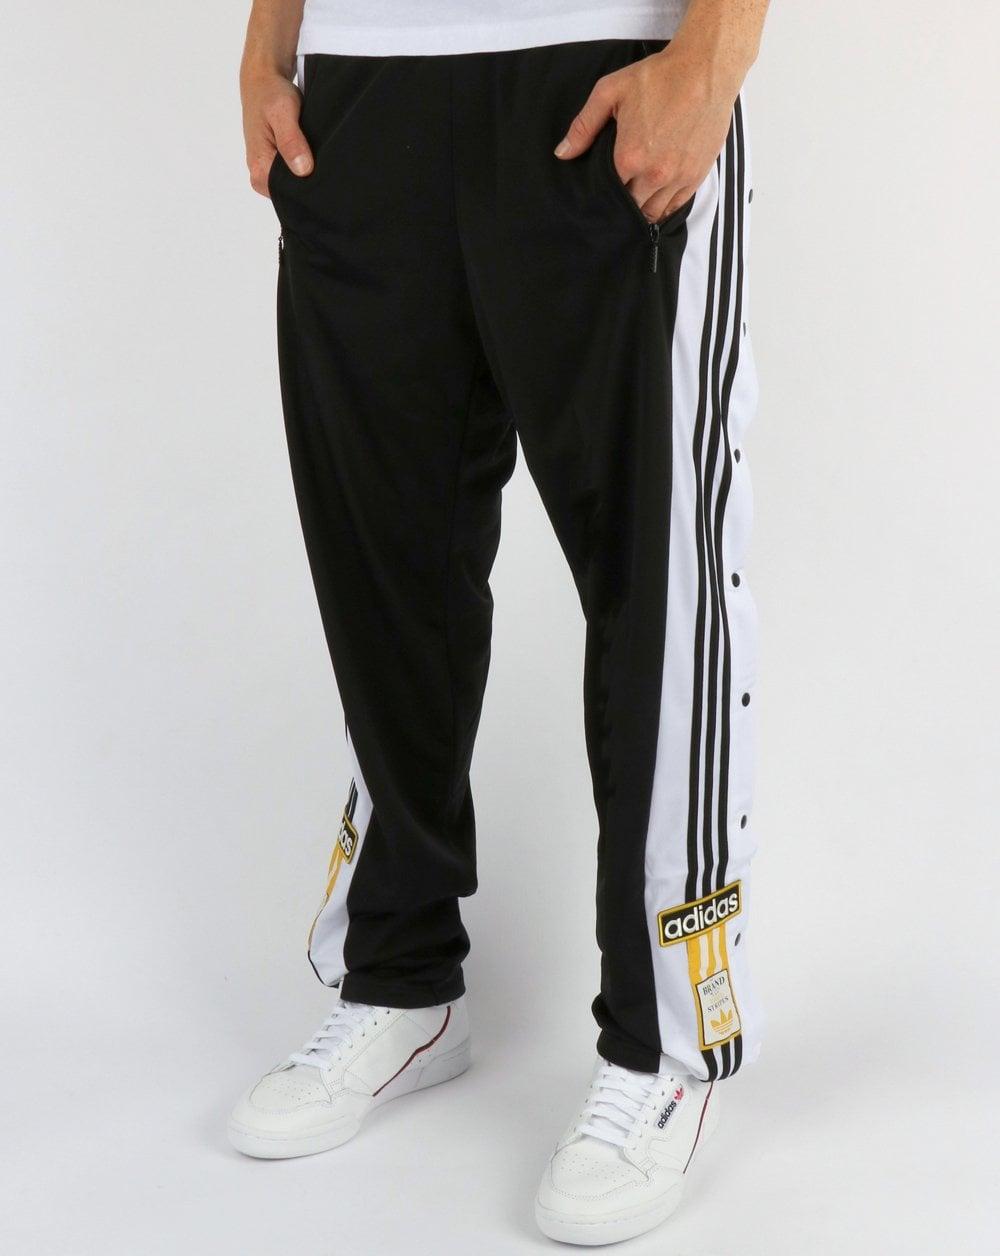 no sale tax various design official images Adidas Originals OG Adibreak Track Pants Black